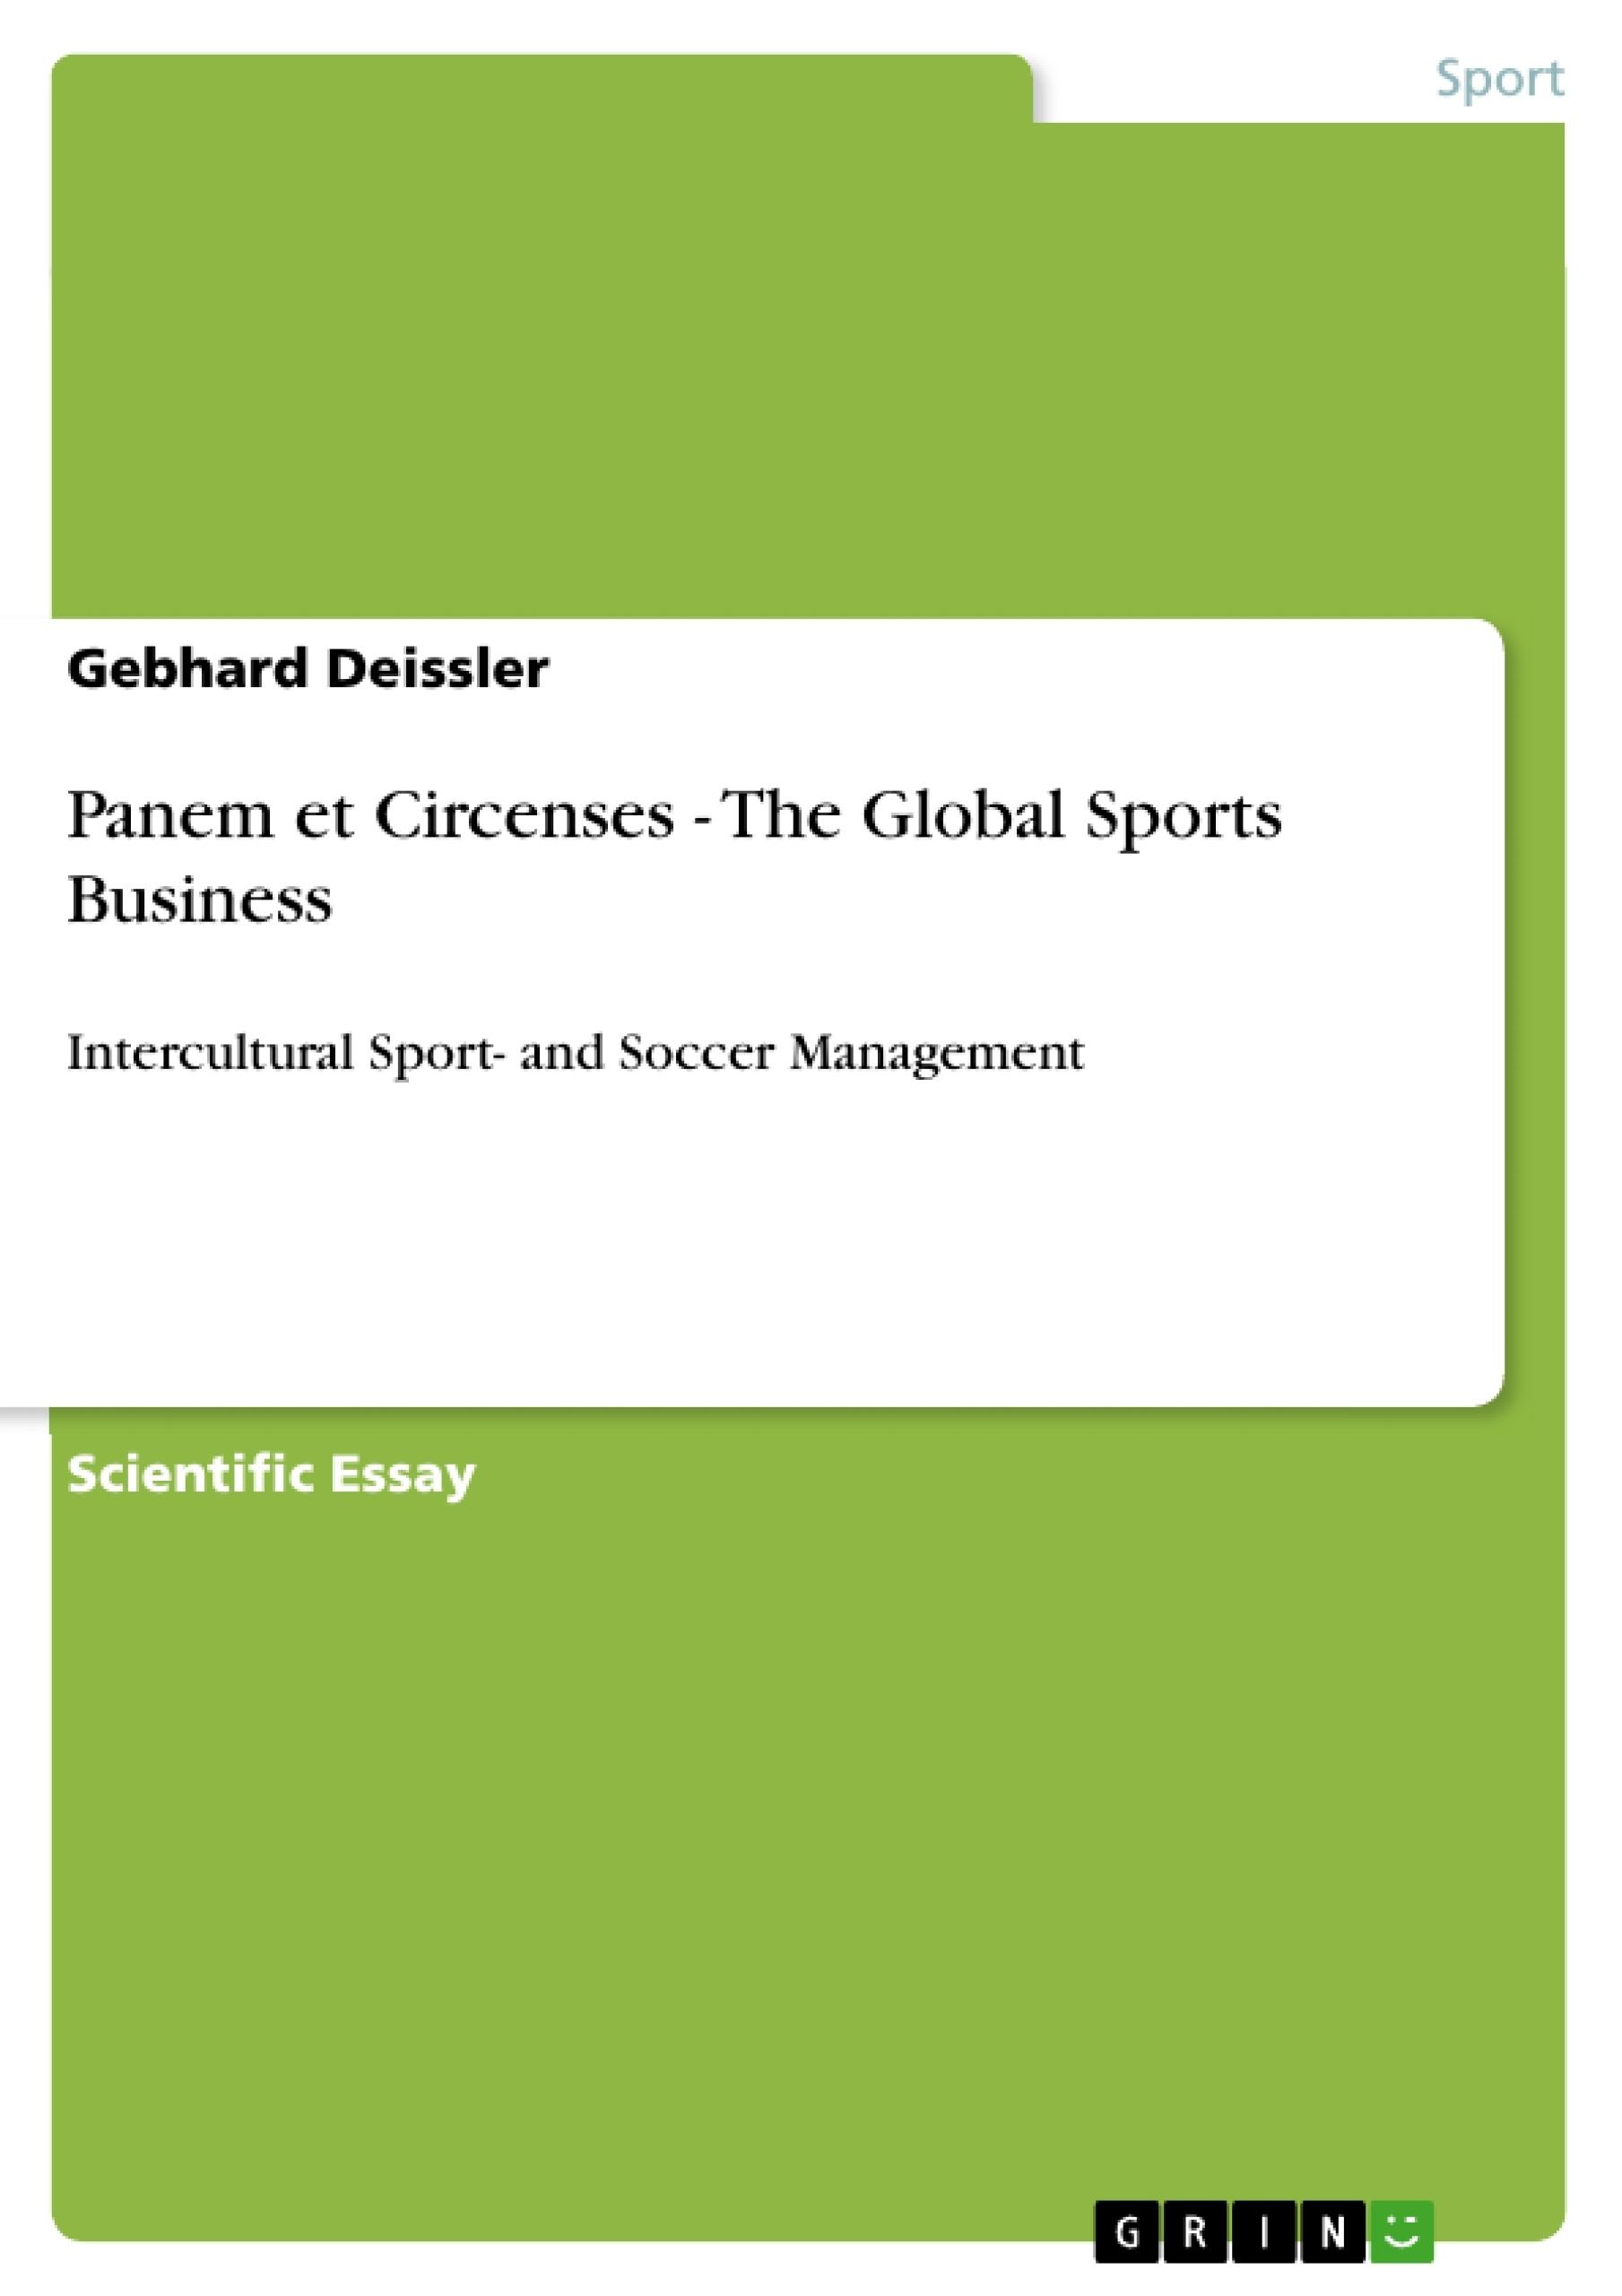 Title: Panem et Circenses - The Global Sports Business